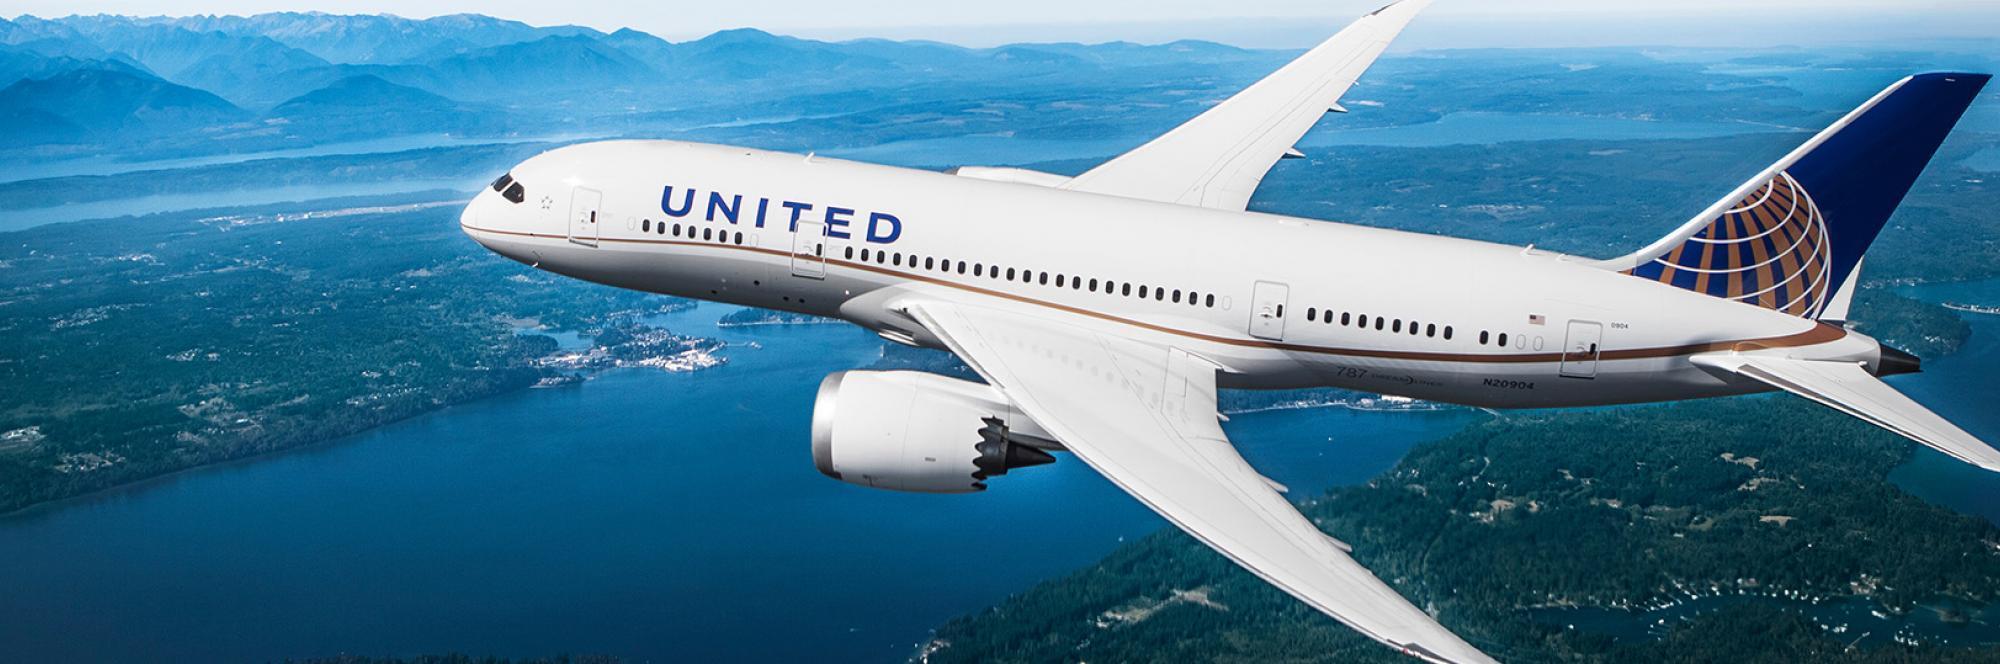 United Airlines Veterans Advantage